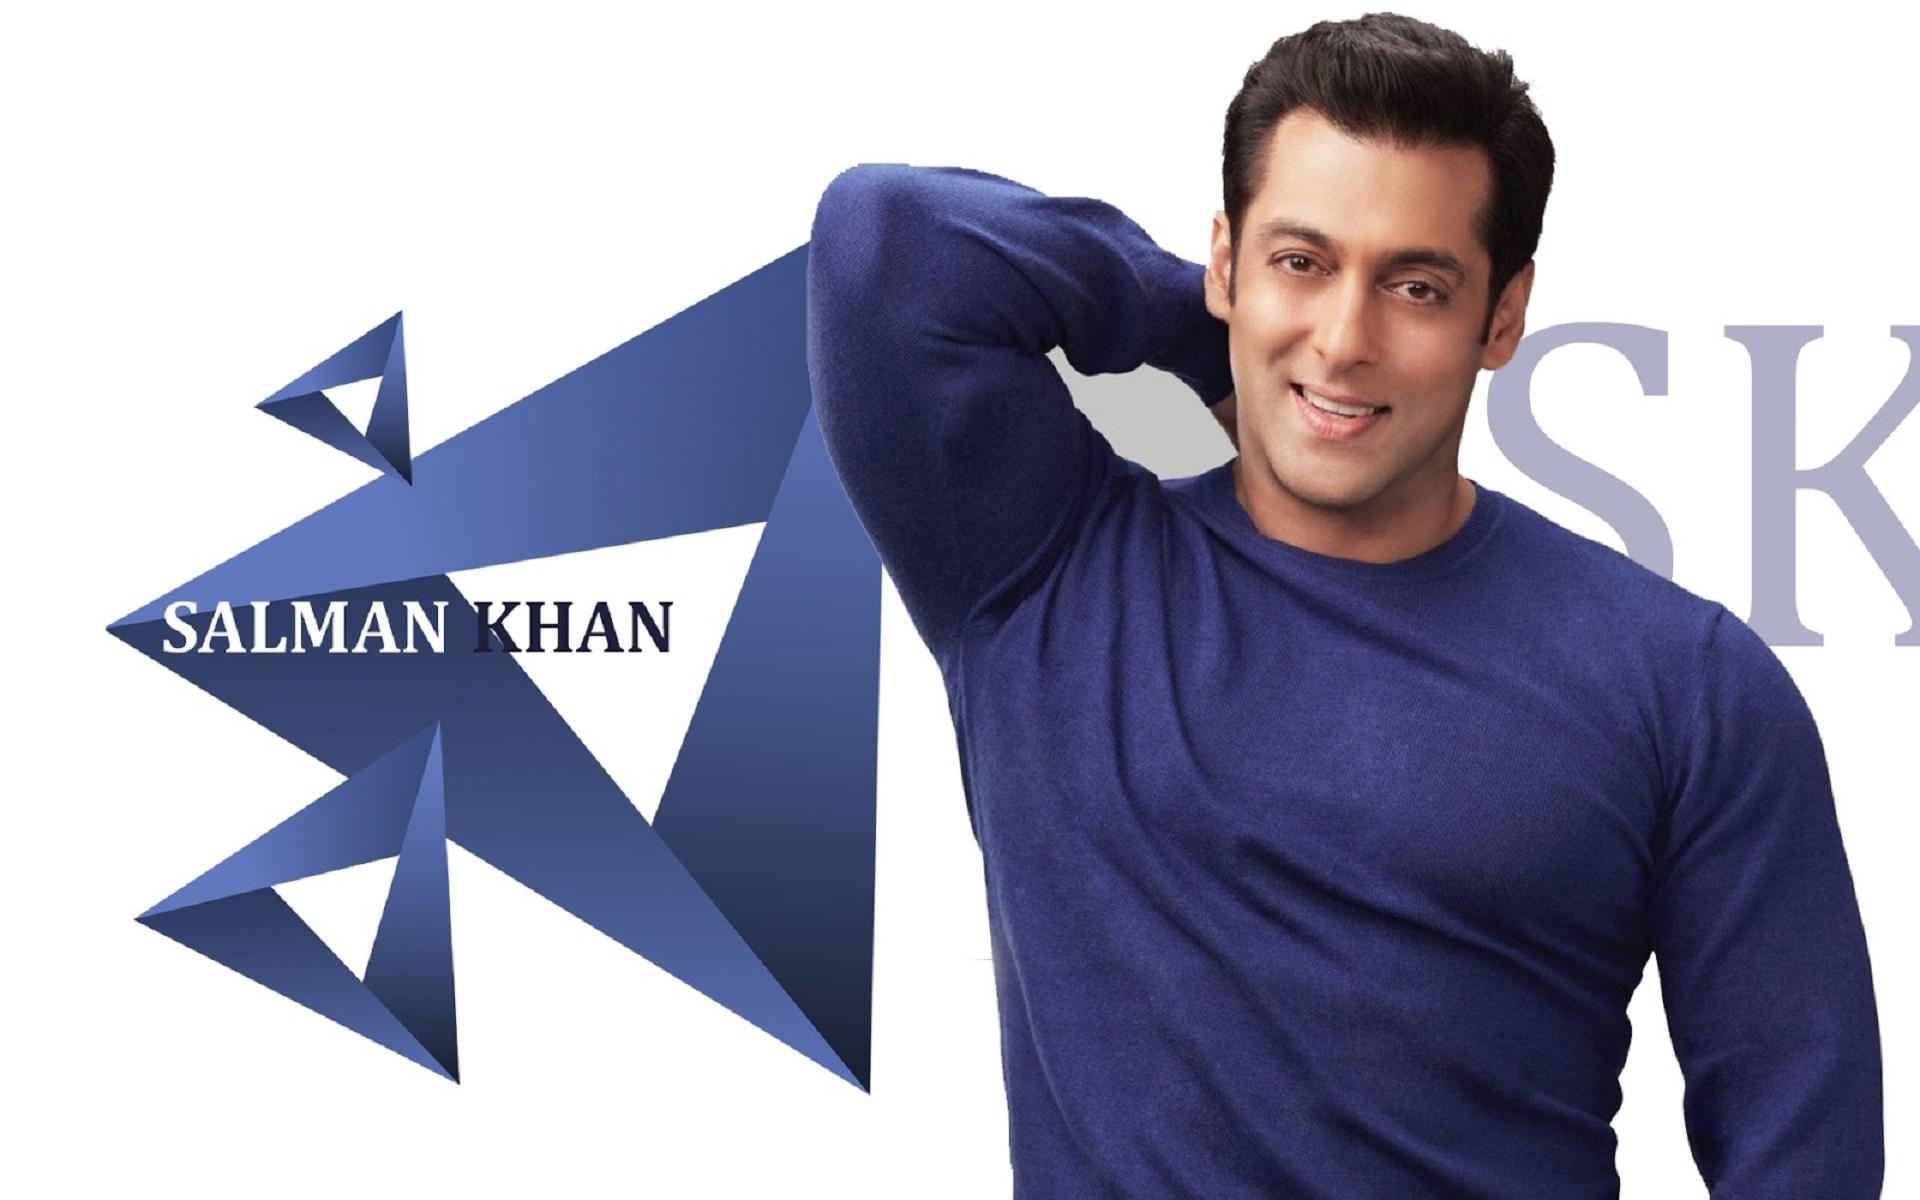 Salman Khan For Desktop